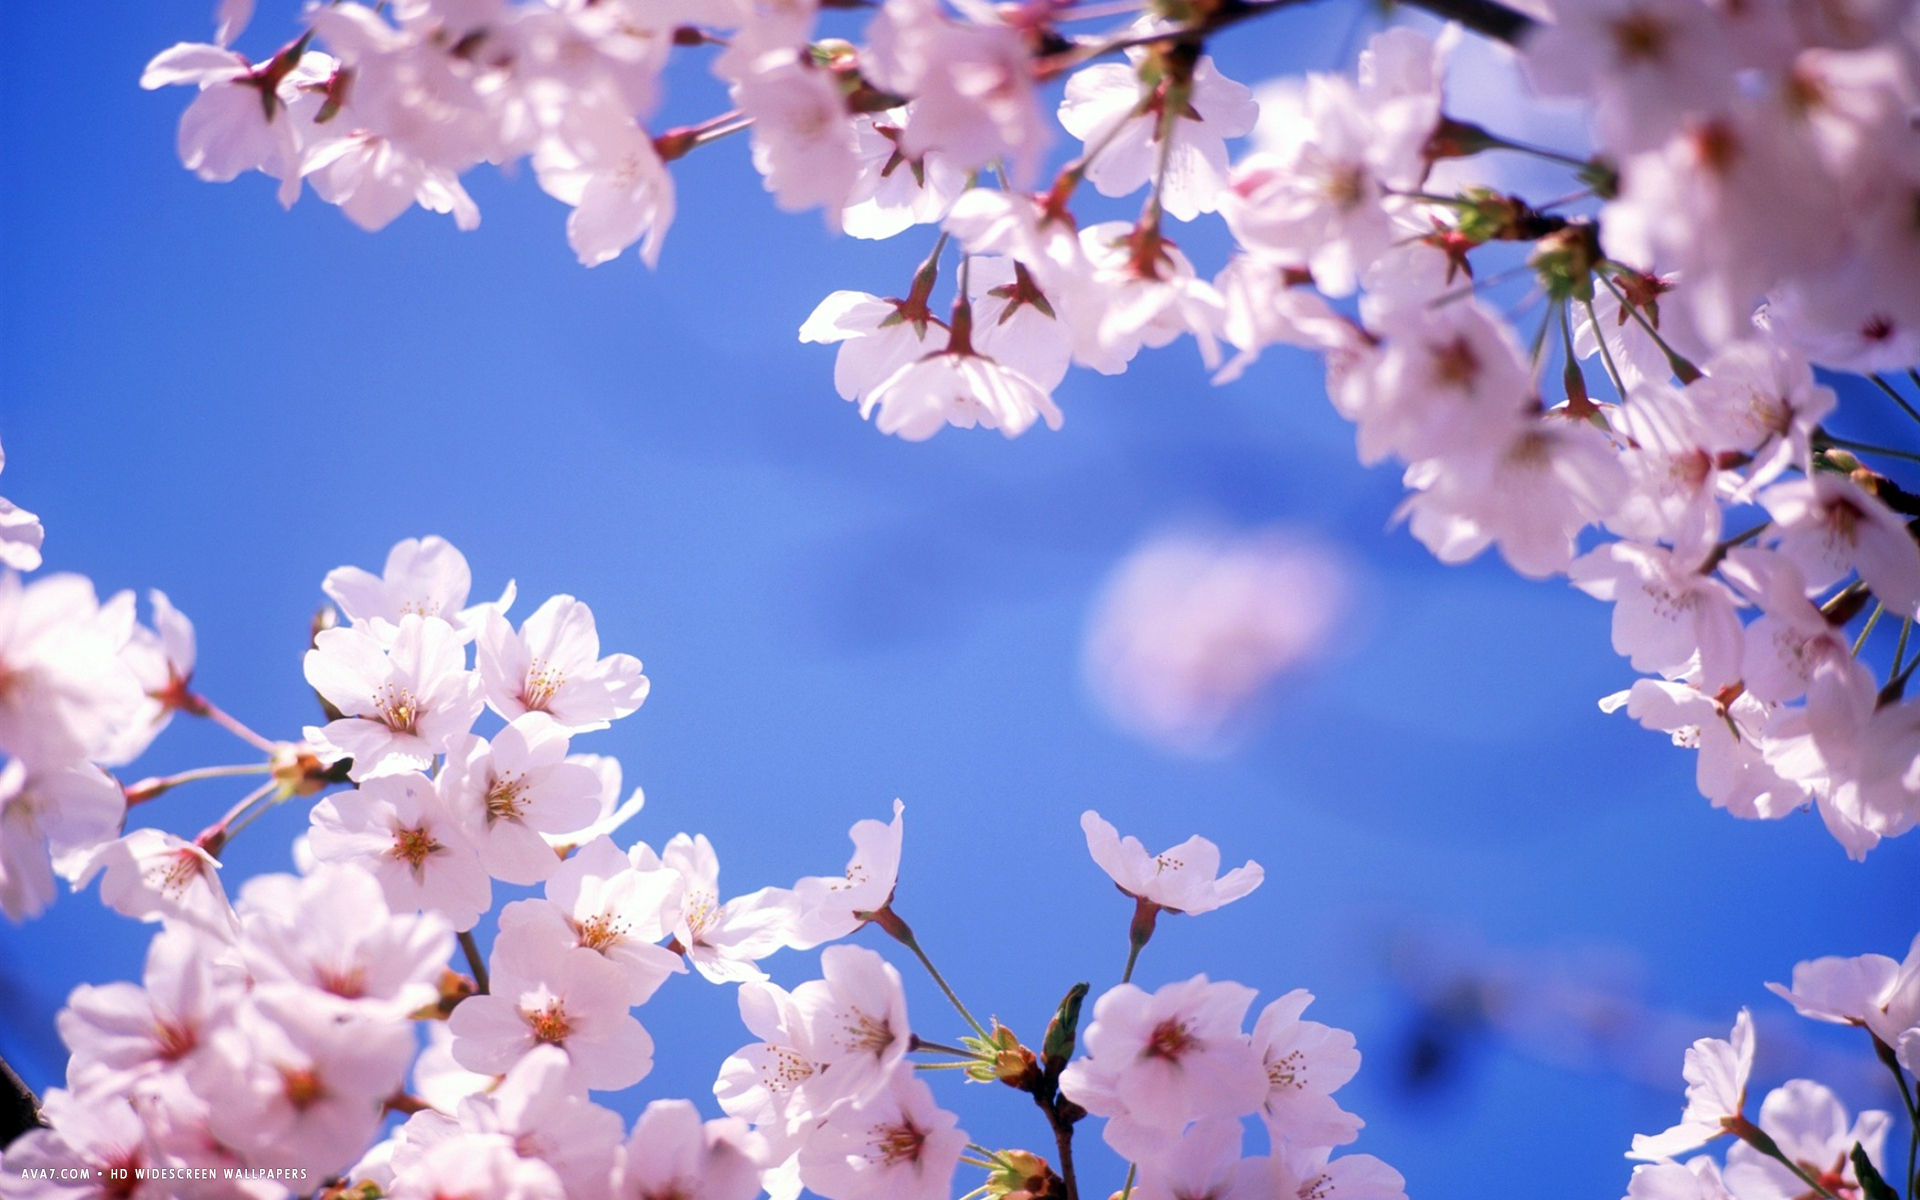 cherry blossom hd wallpaper wallpapersafari. Black Bedroom Furniture Sets. Home Design Ideas